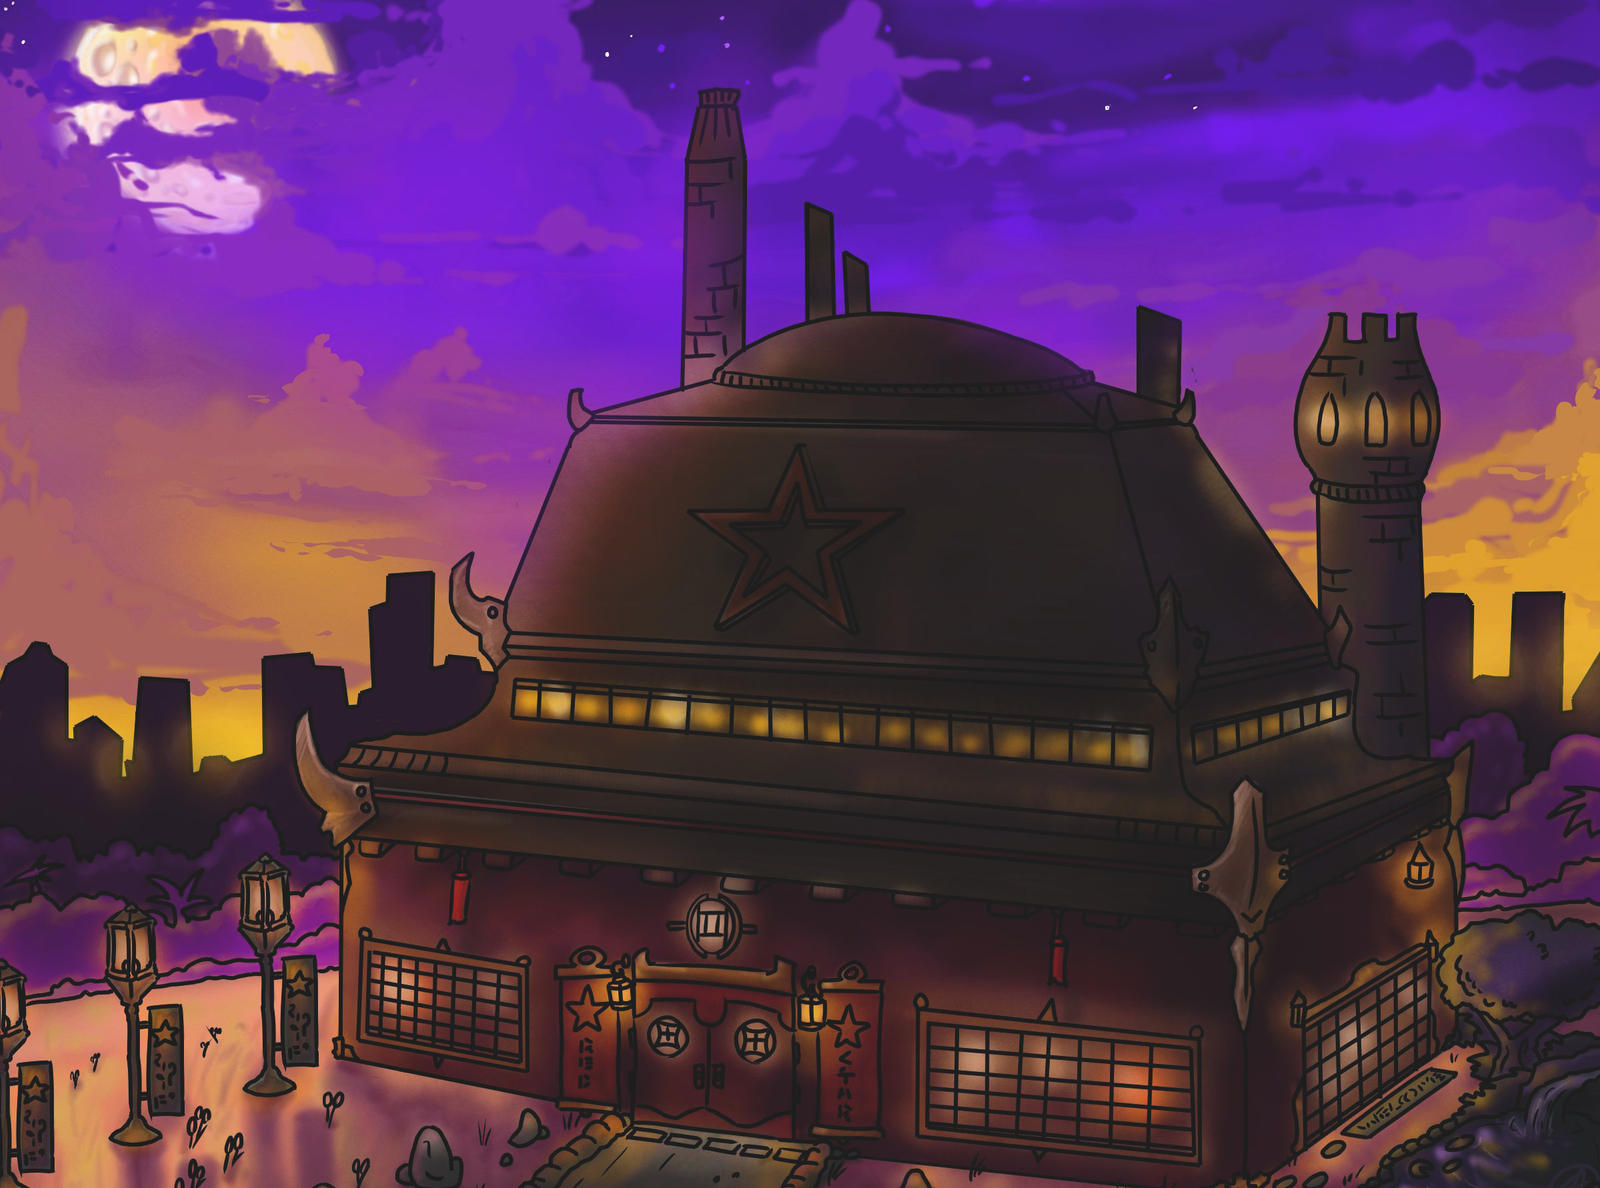 Khan's Tavern by chevy1616